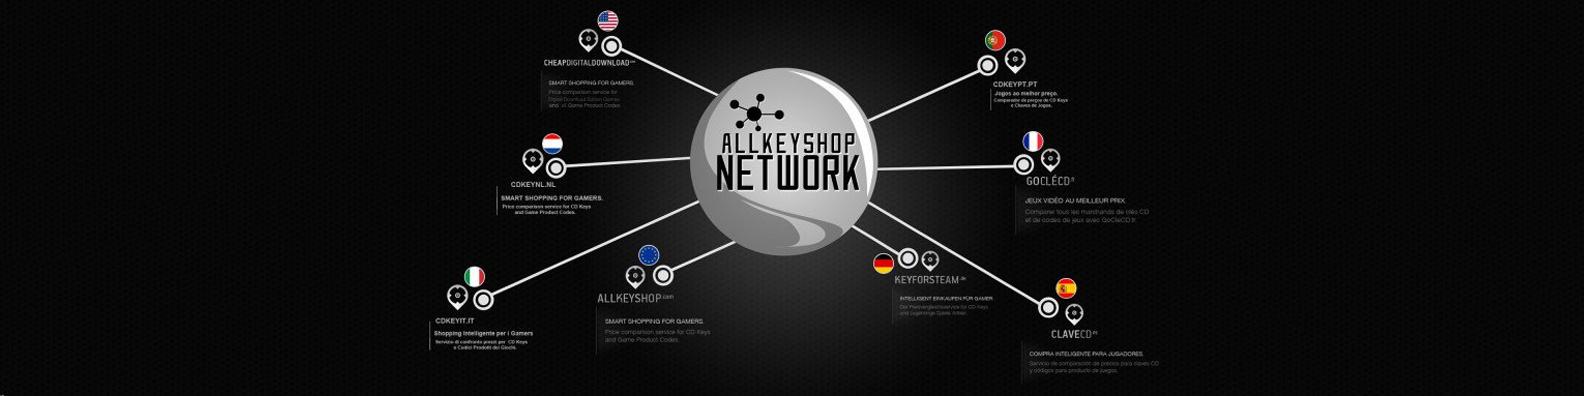 Allkeyshop network nebula